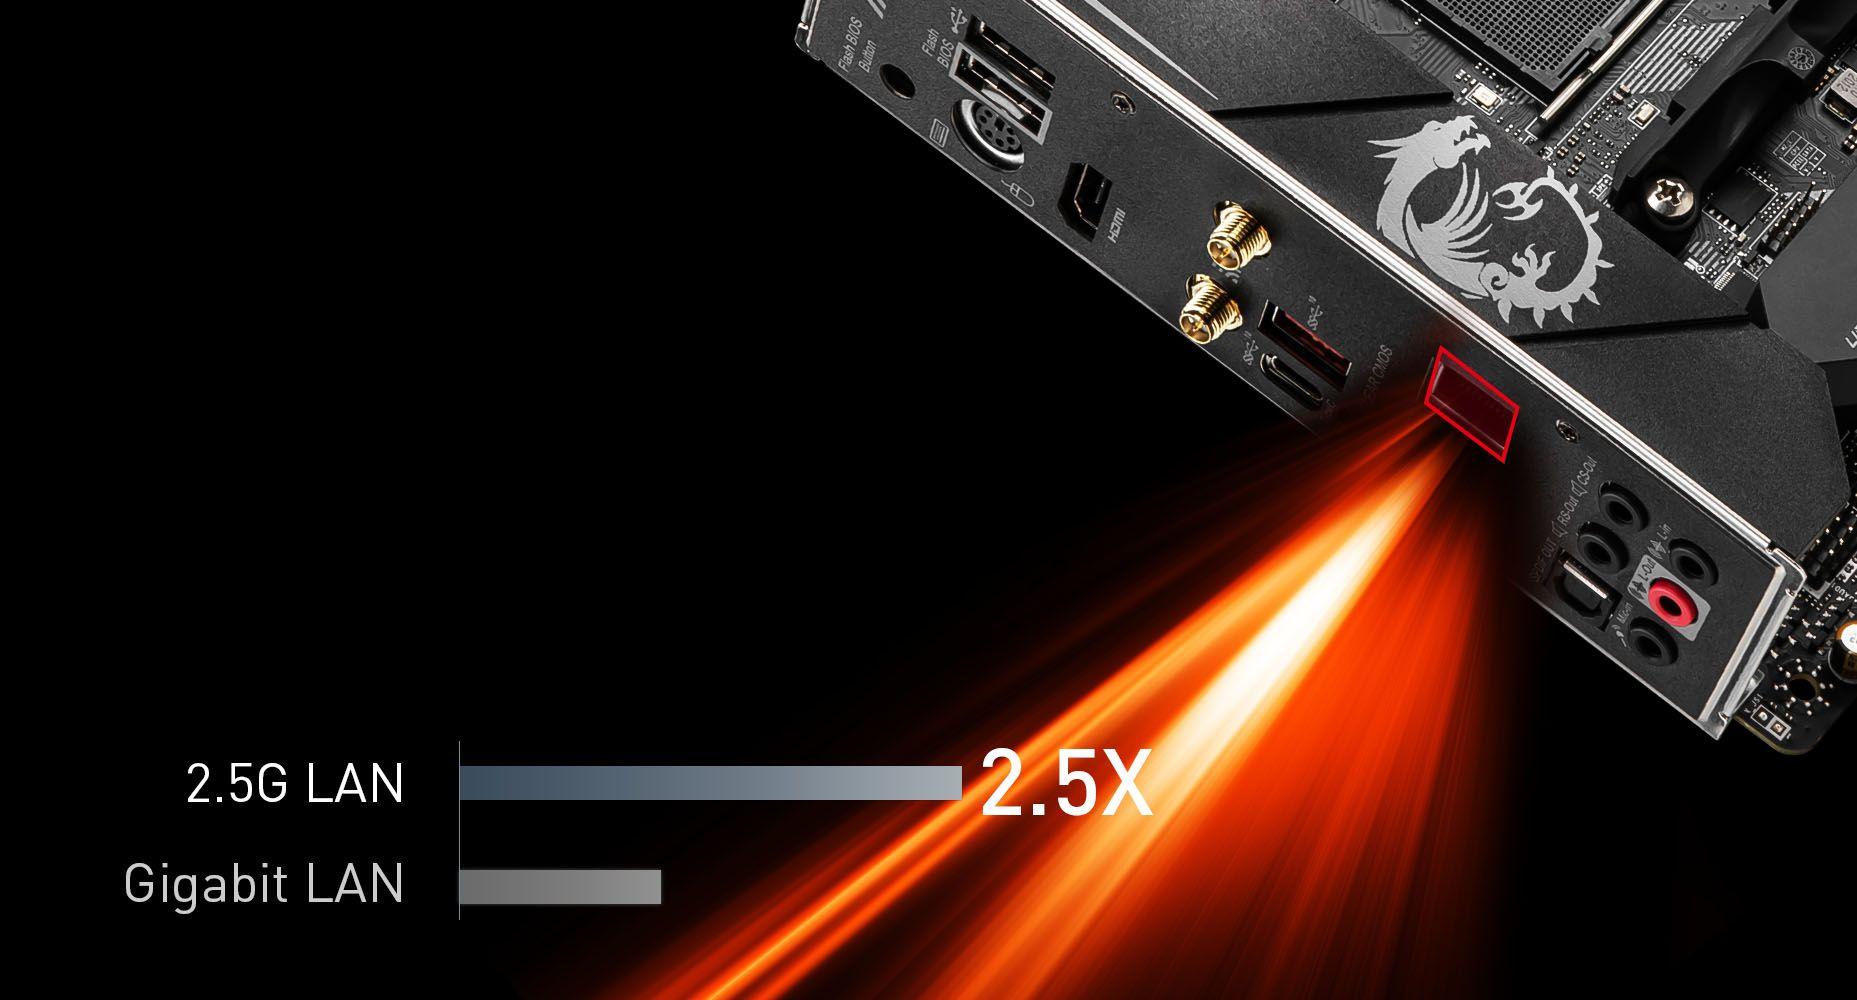 MSI MPG B550I GAMING EDGE MAX WIFI MAXIMIUM DATA TRANSFER WITH 2.5G LAN